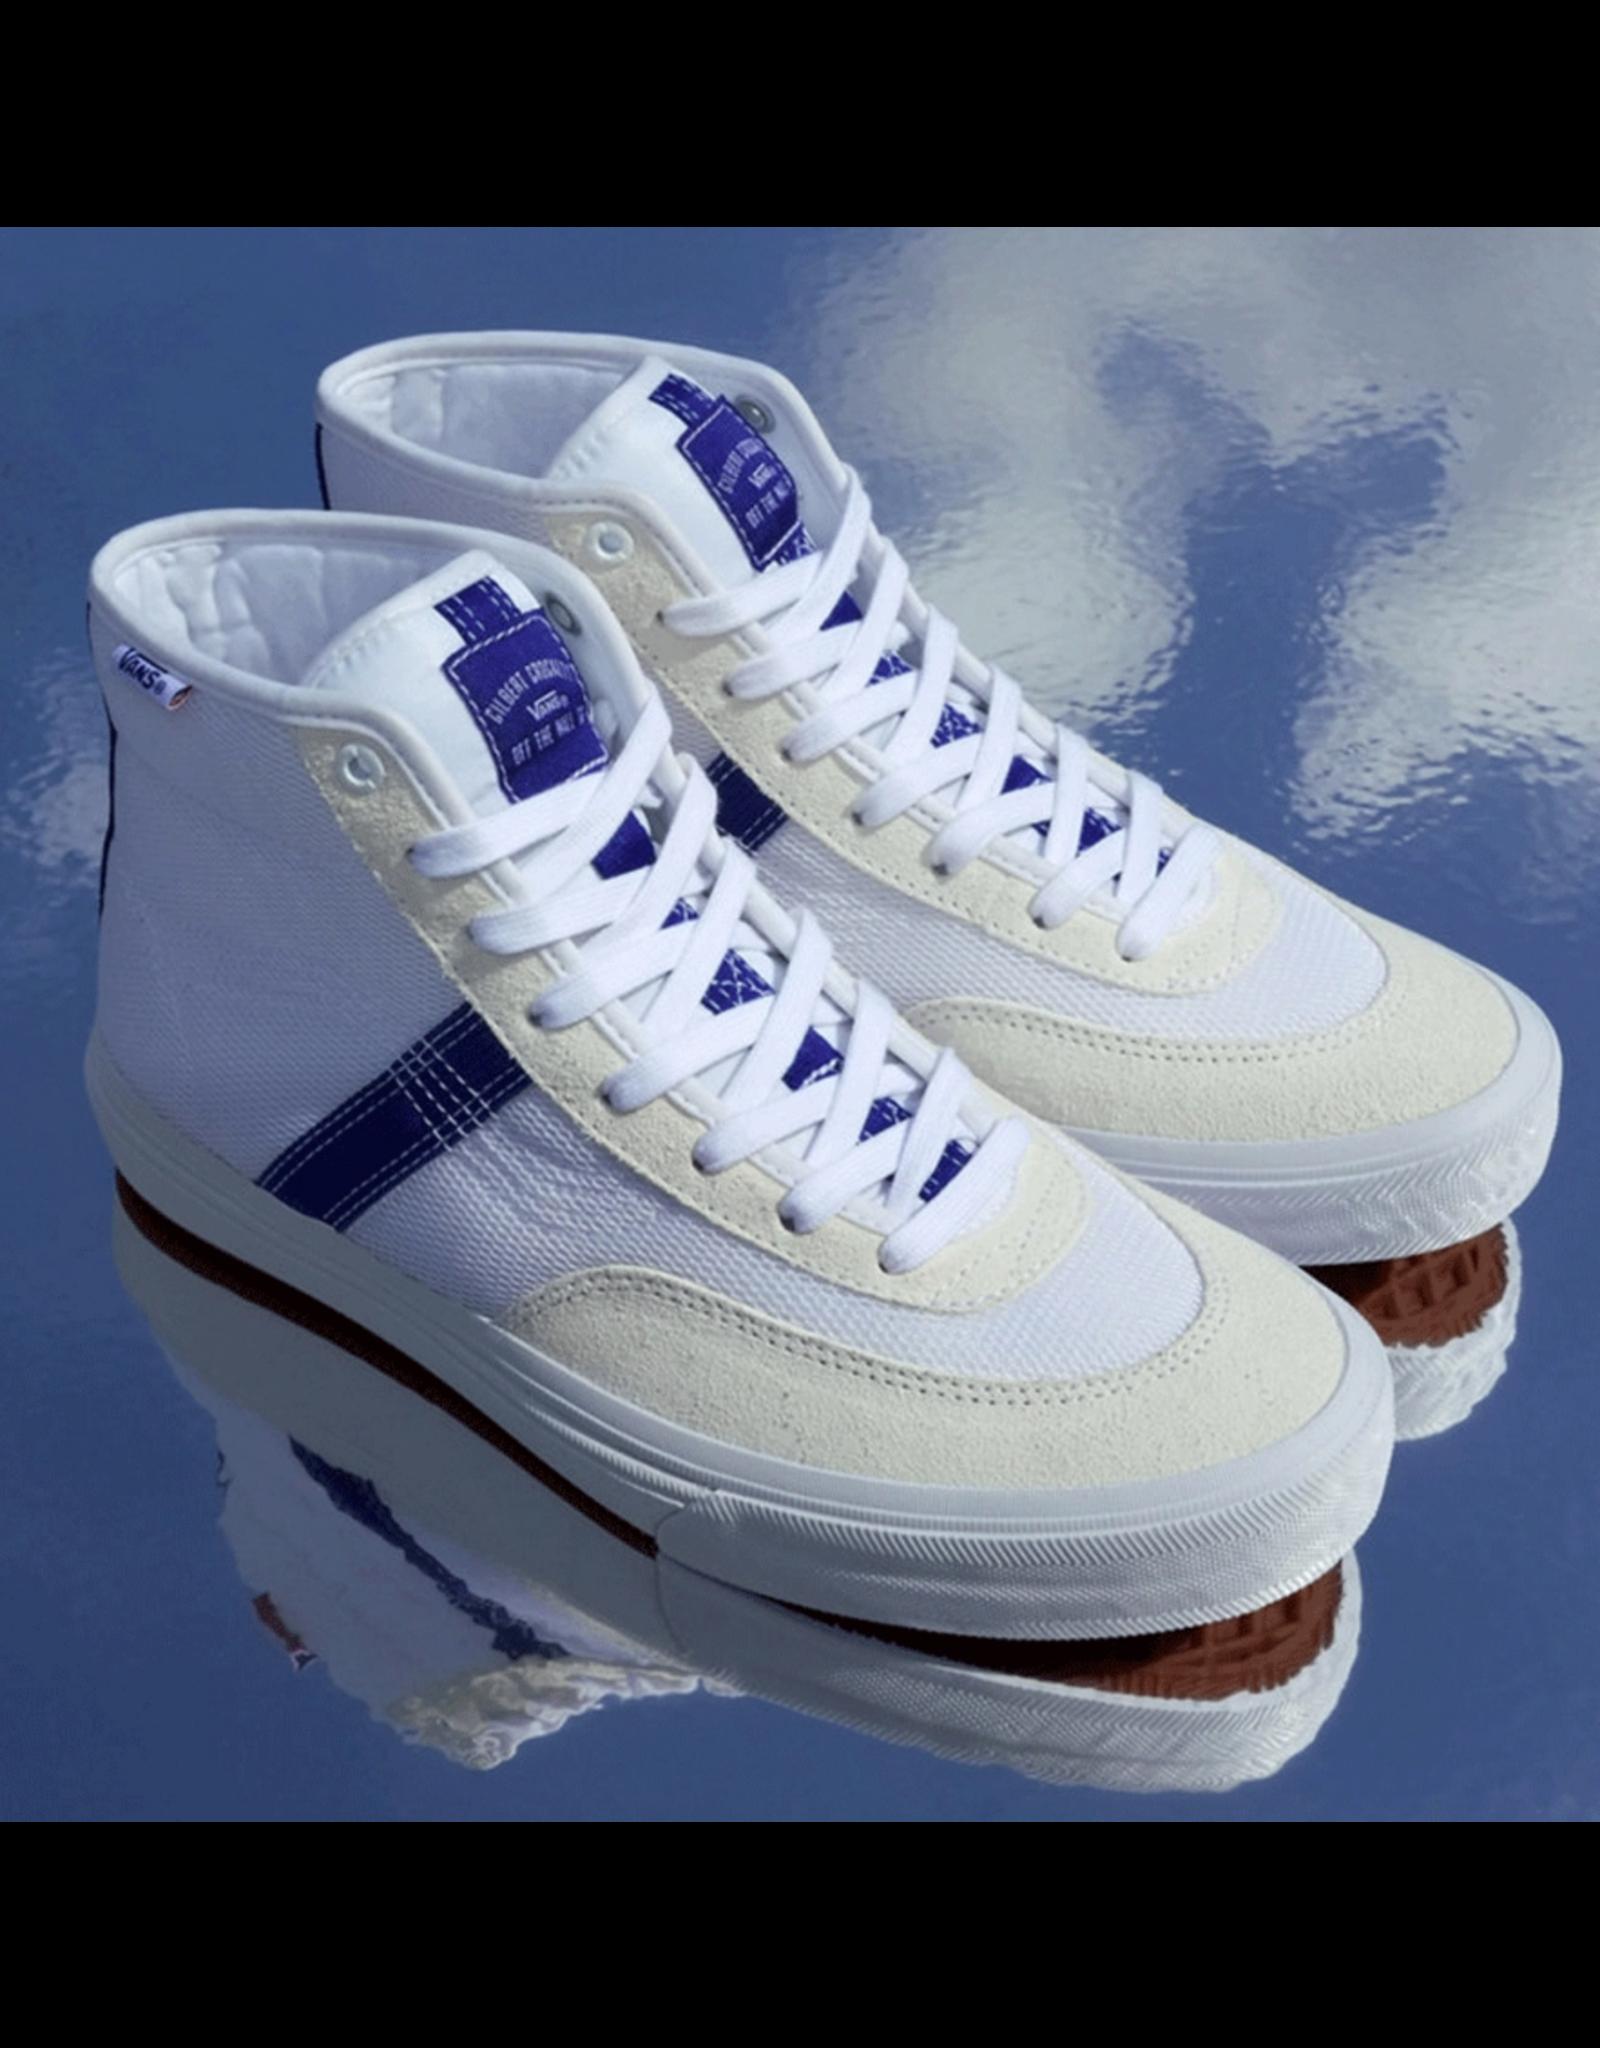 Vans x Quasi Crockett High Pro LTD - True White